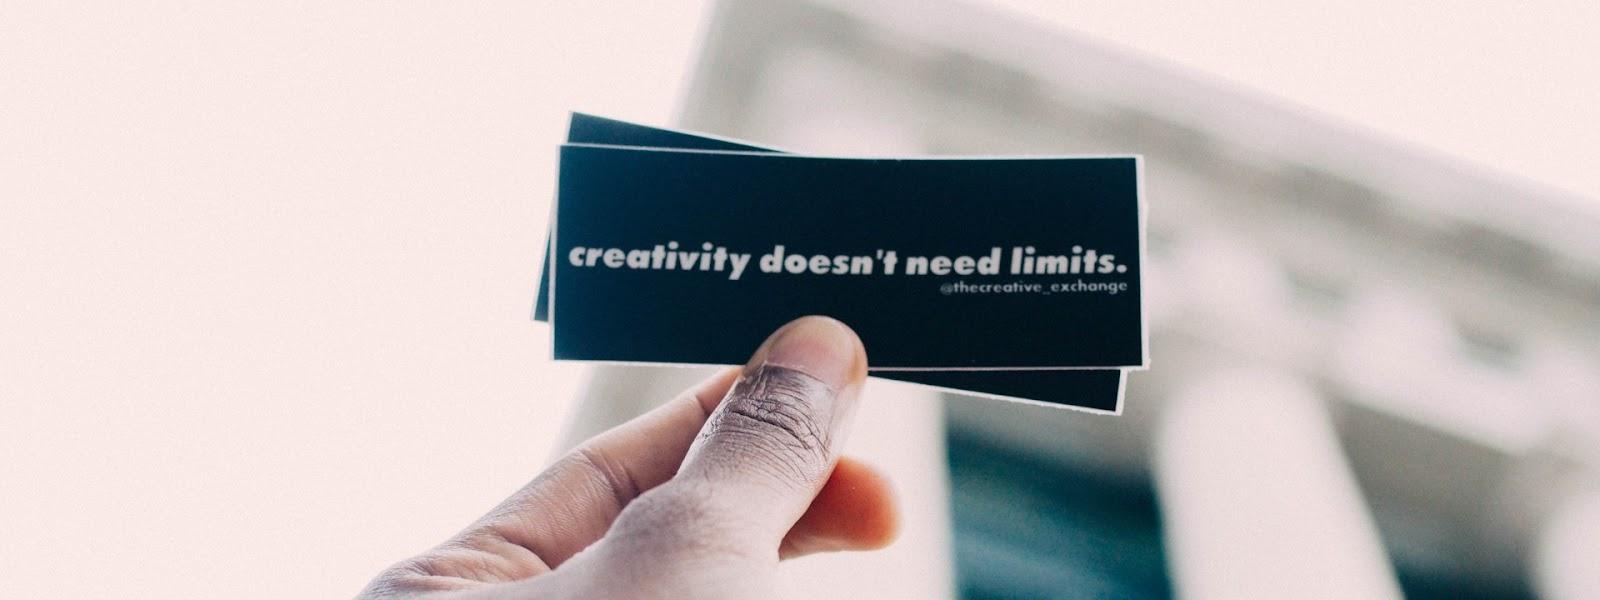 The social benefits of intrapreneurship: same creativity, more life